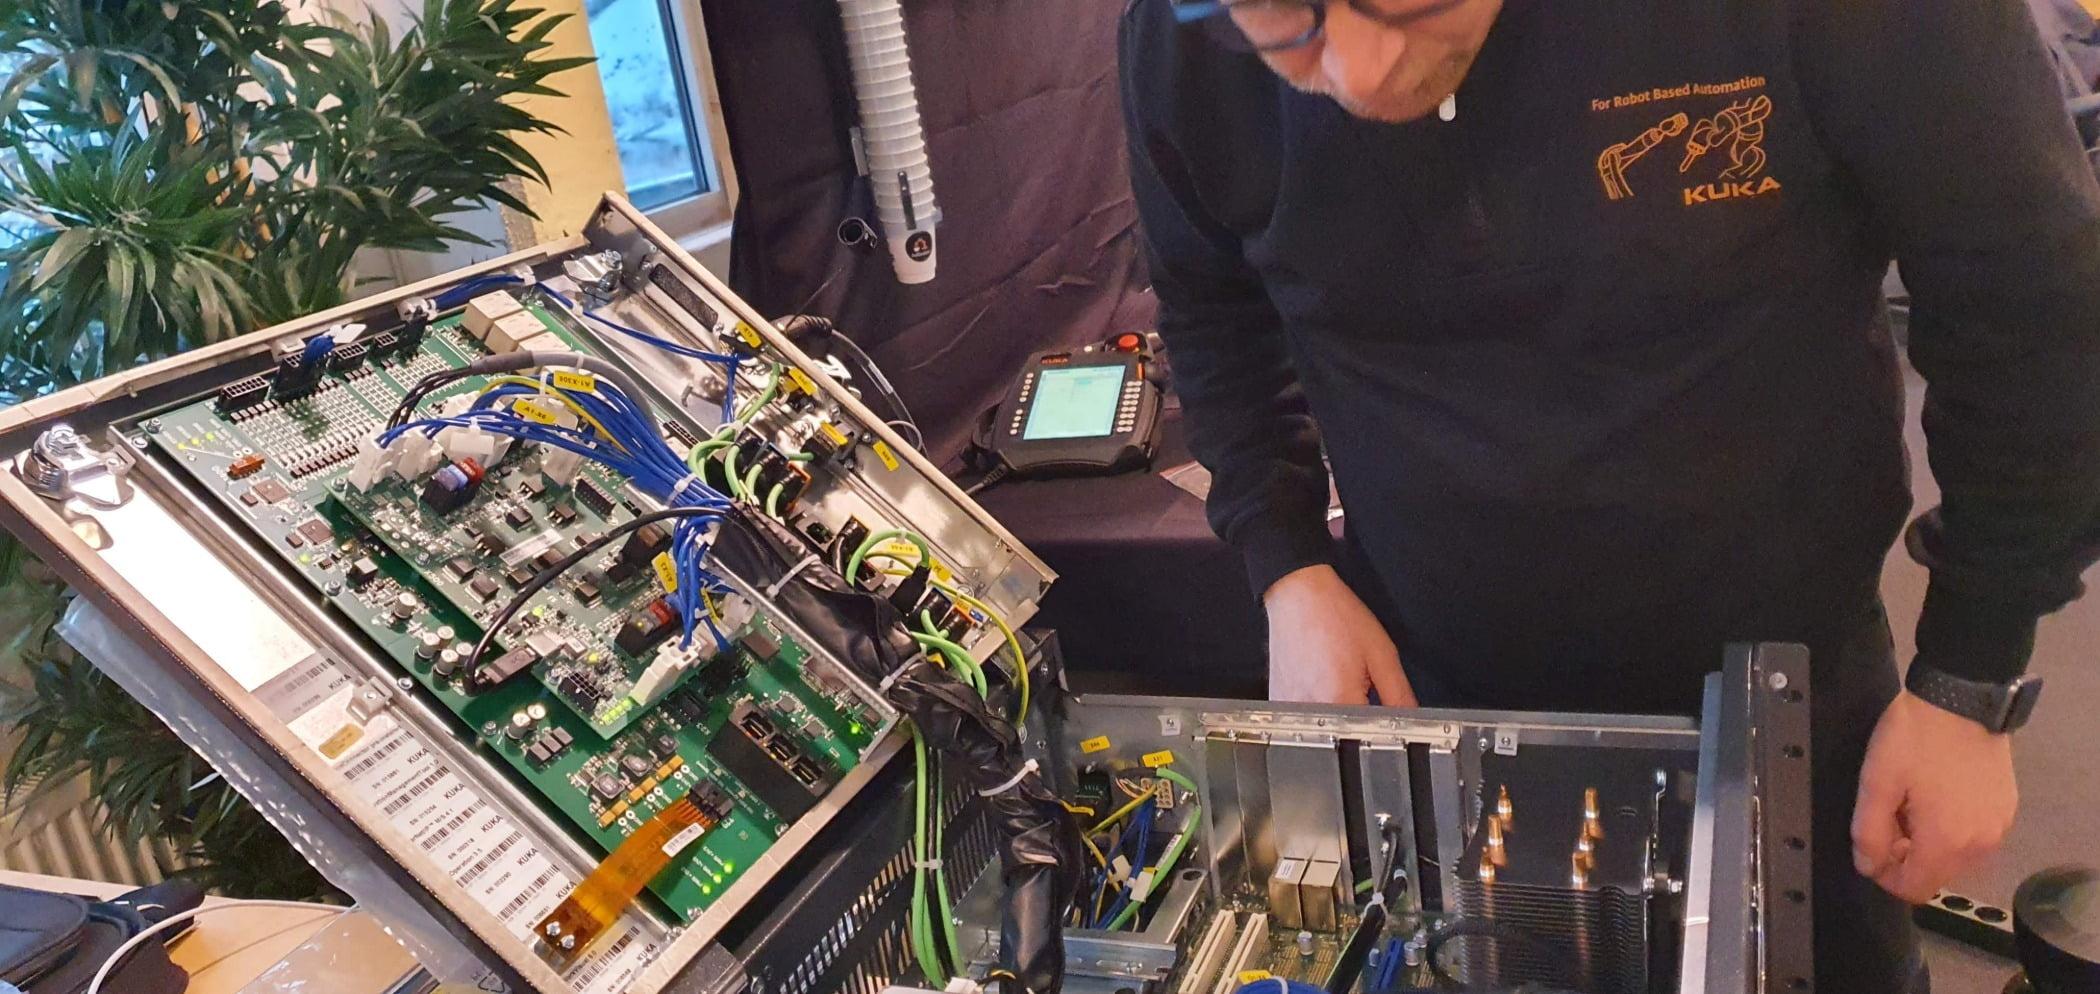 Passive circuit component, Hardware programmer, Electronic instrument, Audio equipment